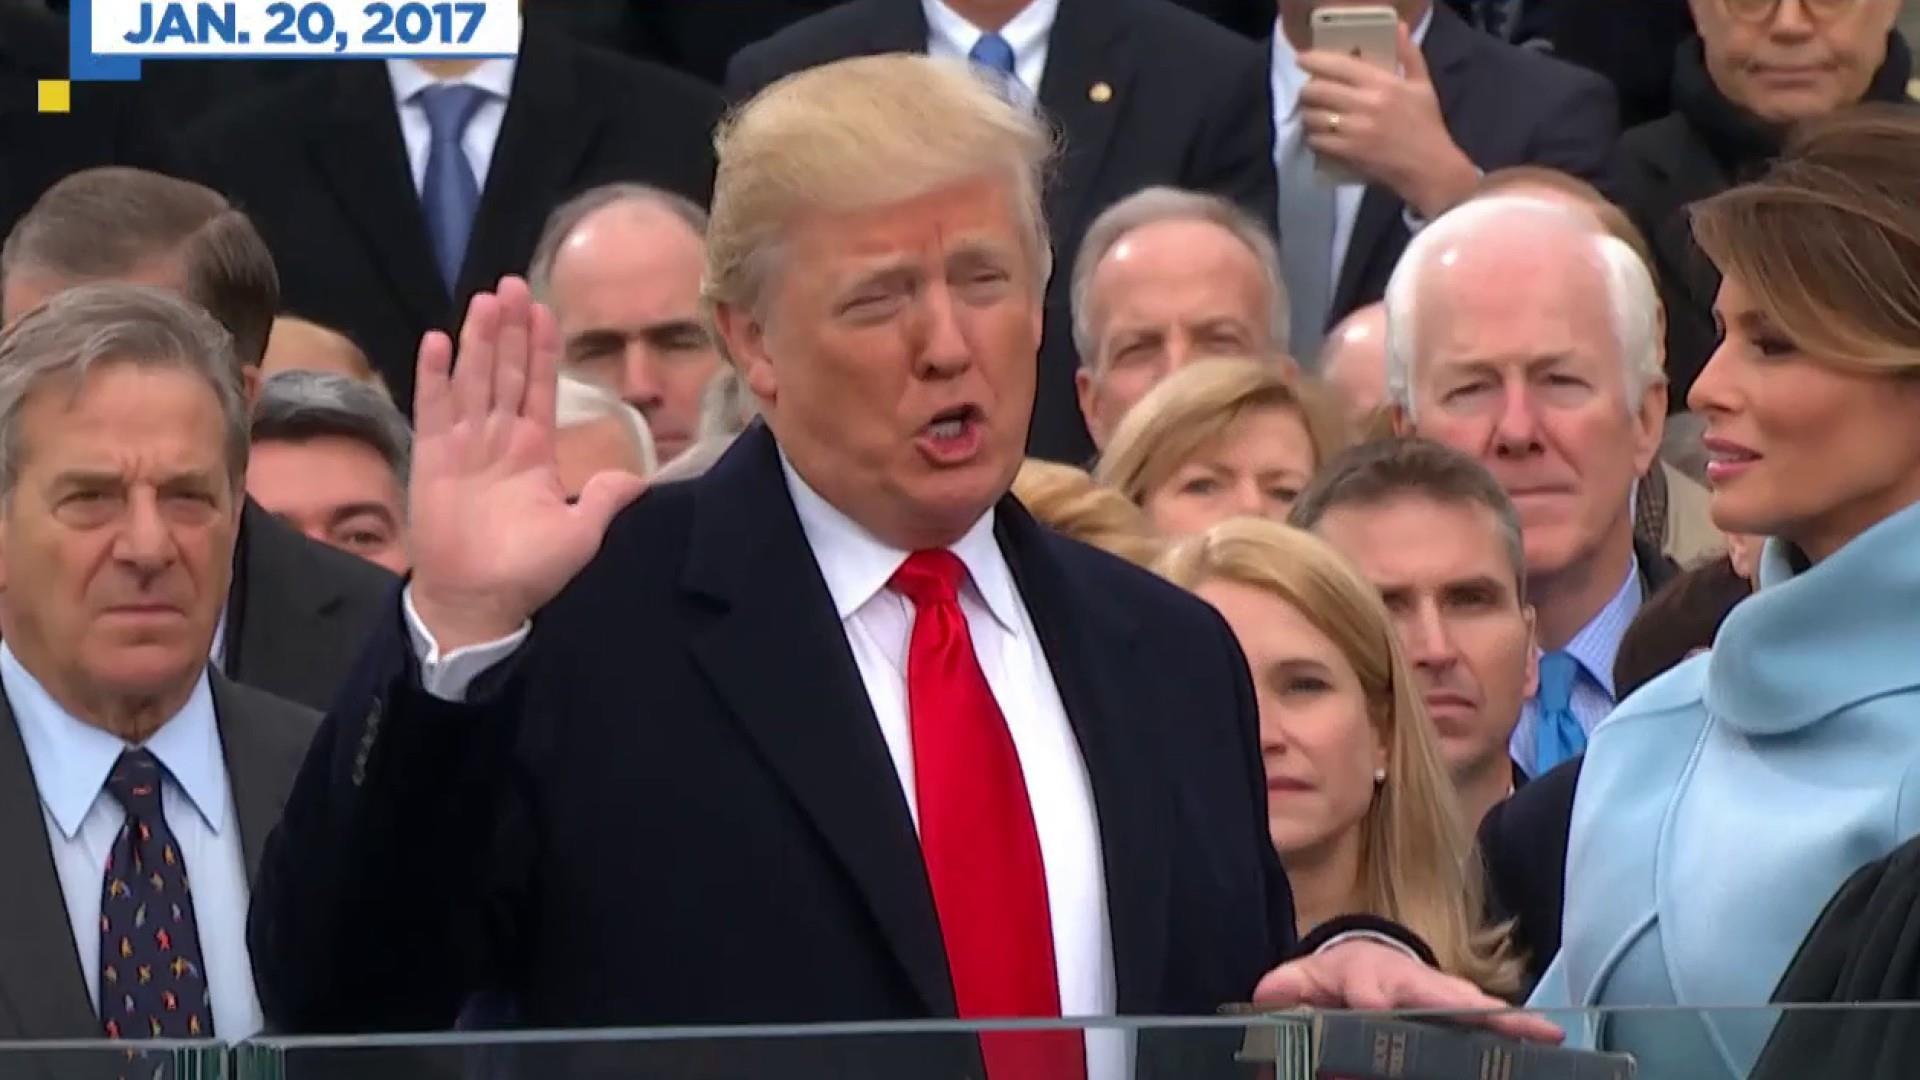 Obama Inauguration CEO: Trump Inauguration 'recipe for corruption'